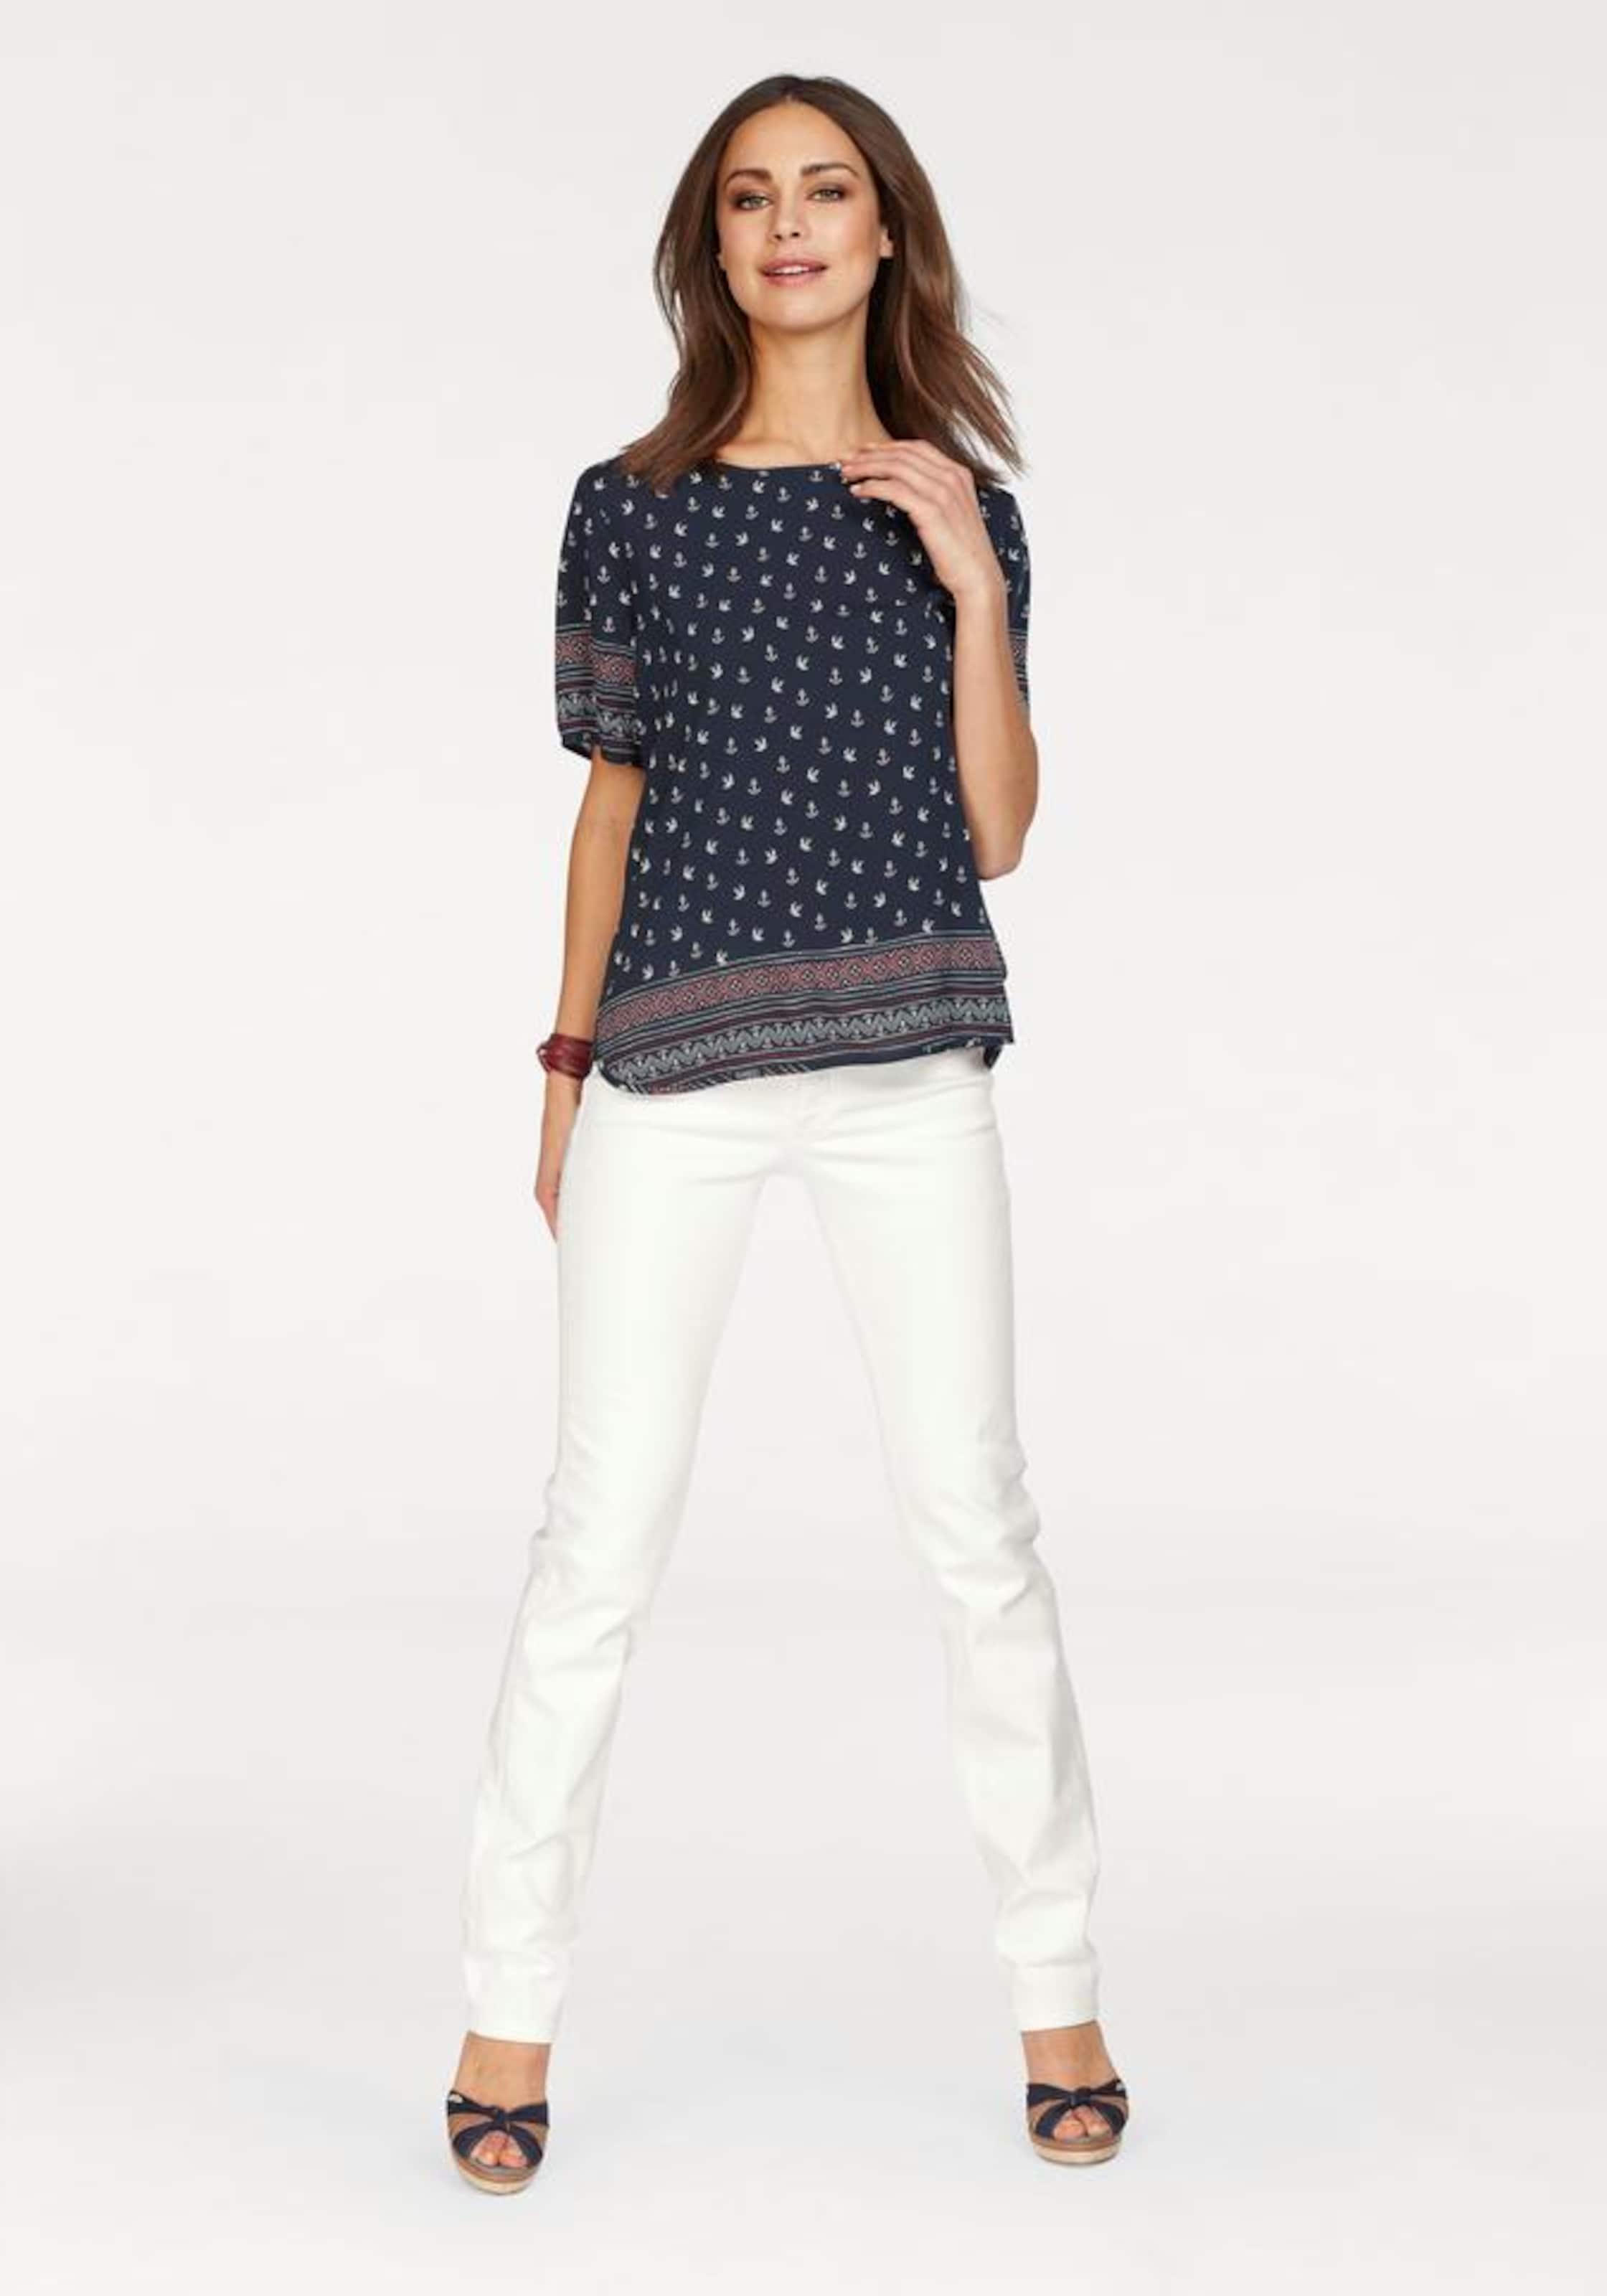 8 True Weiß Paradise' Mac 'angela 7 jeans In QeBrdxCoW